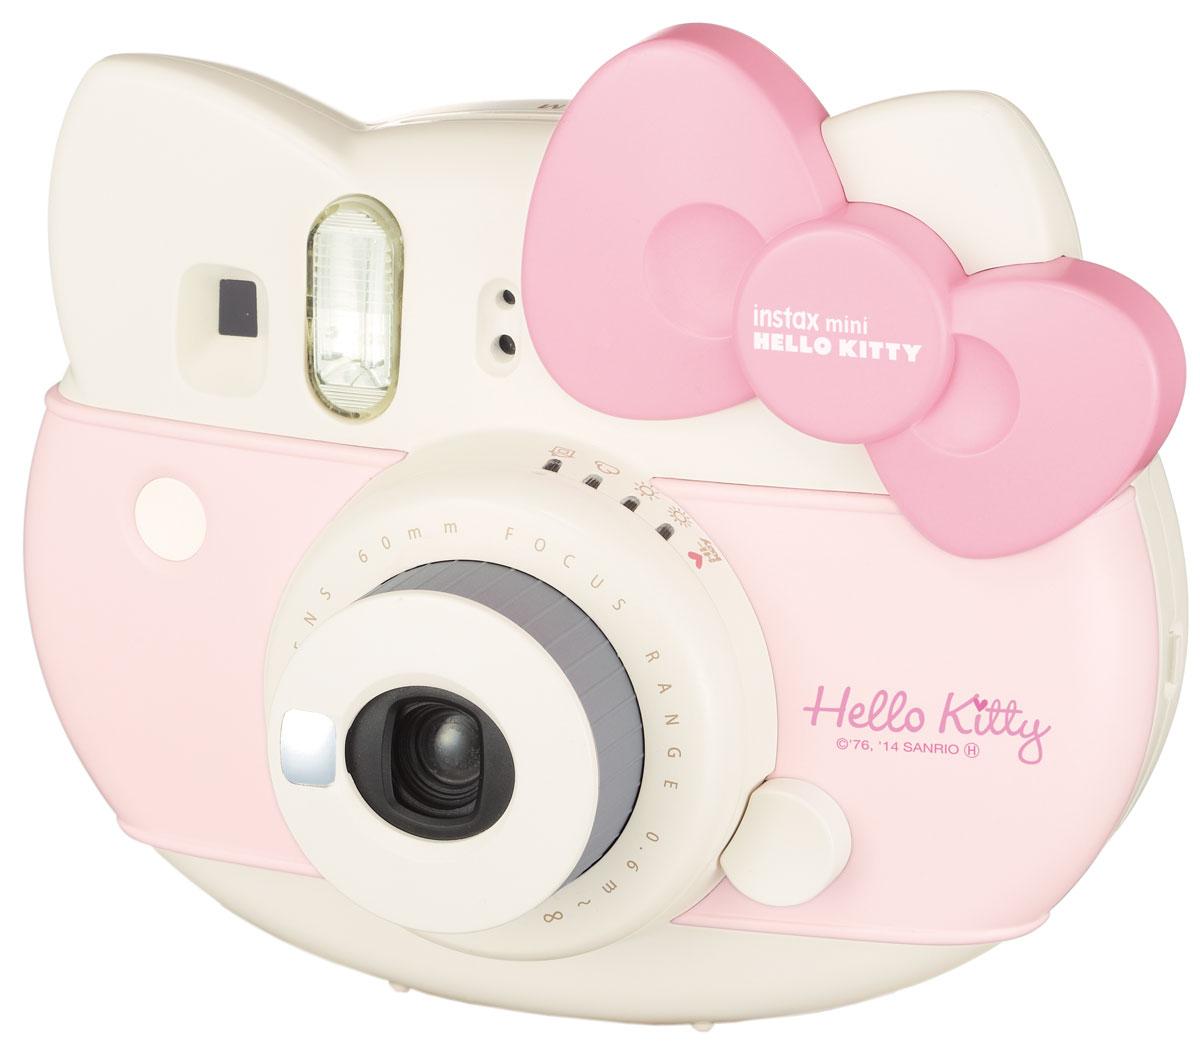 Fujifilm Instax Mini Hello Kitty, Pink фотоаппарат моментальной печати 7pcs hello kitty makeup brush set with iron mini box make up professional facial brushes black pink maquiagem women girls gifts